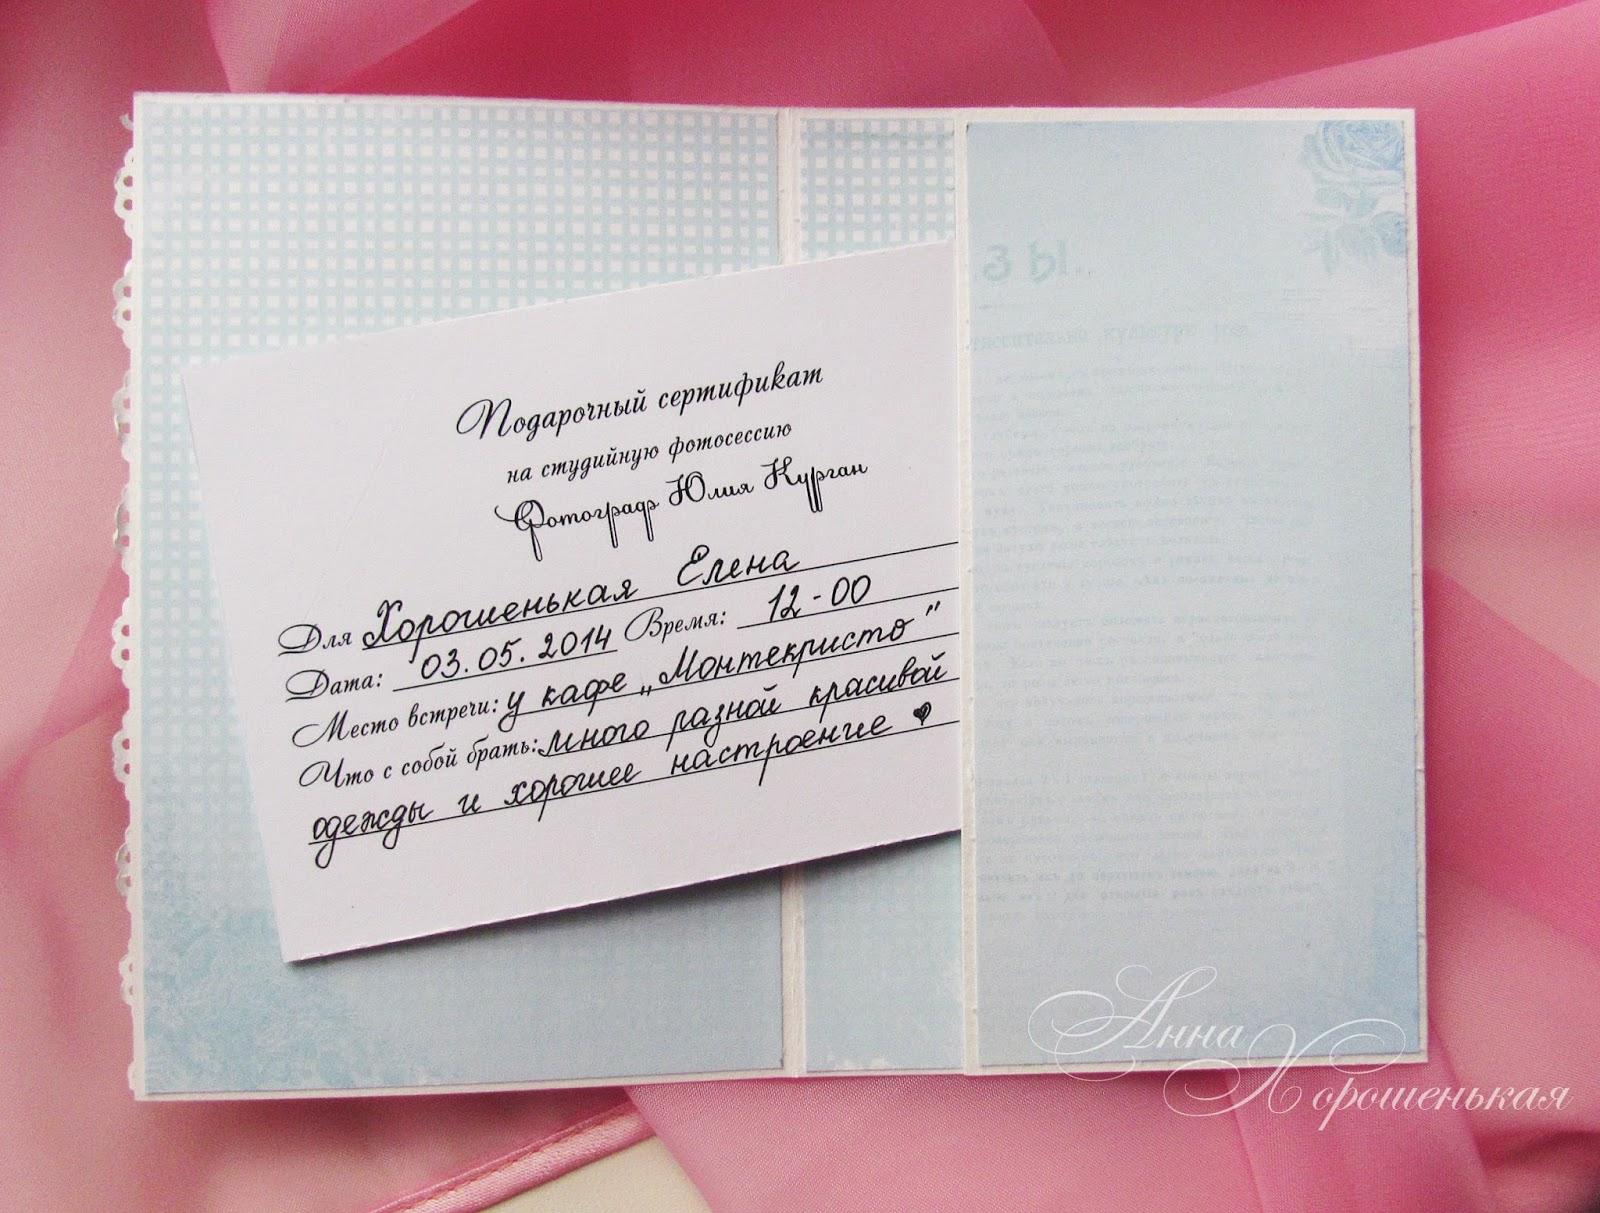 Сертификат желаний для любимого человека своими руками 4